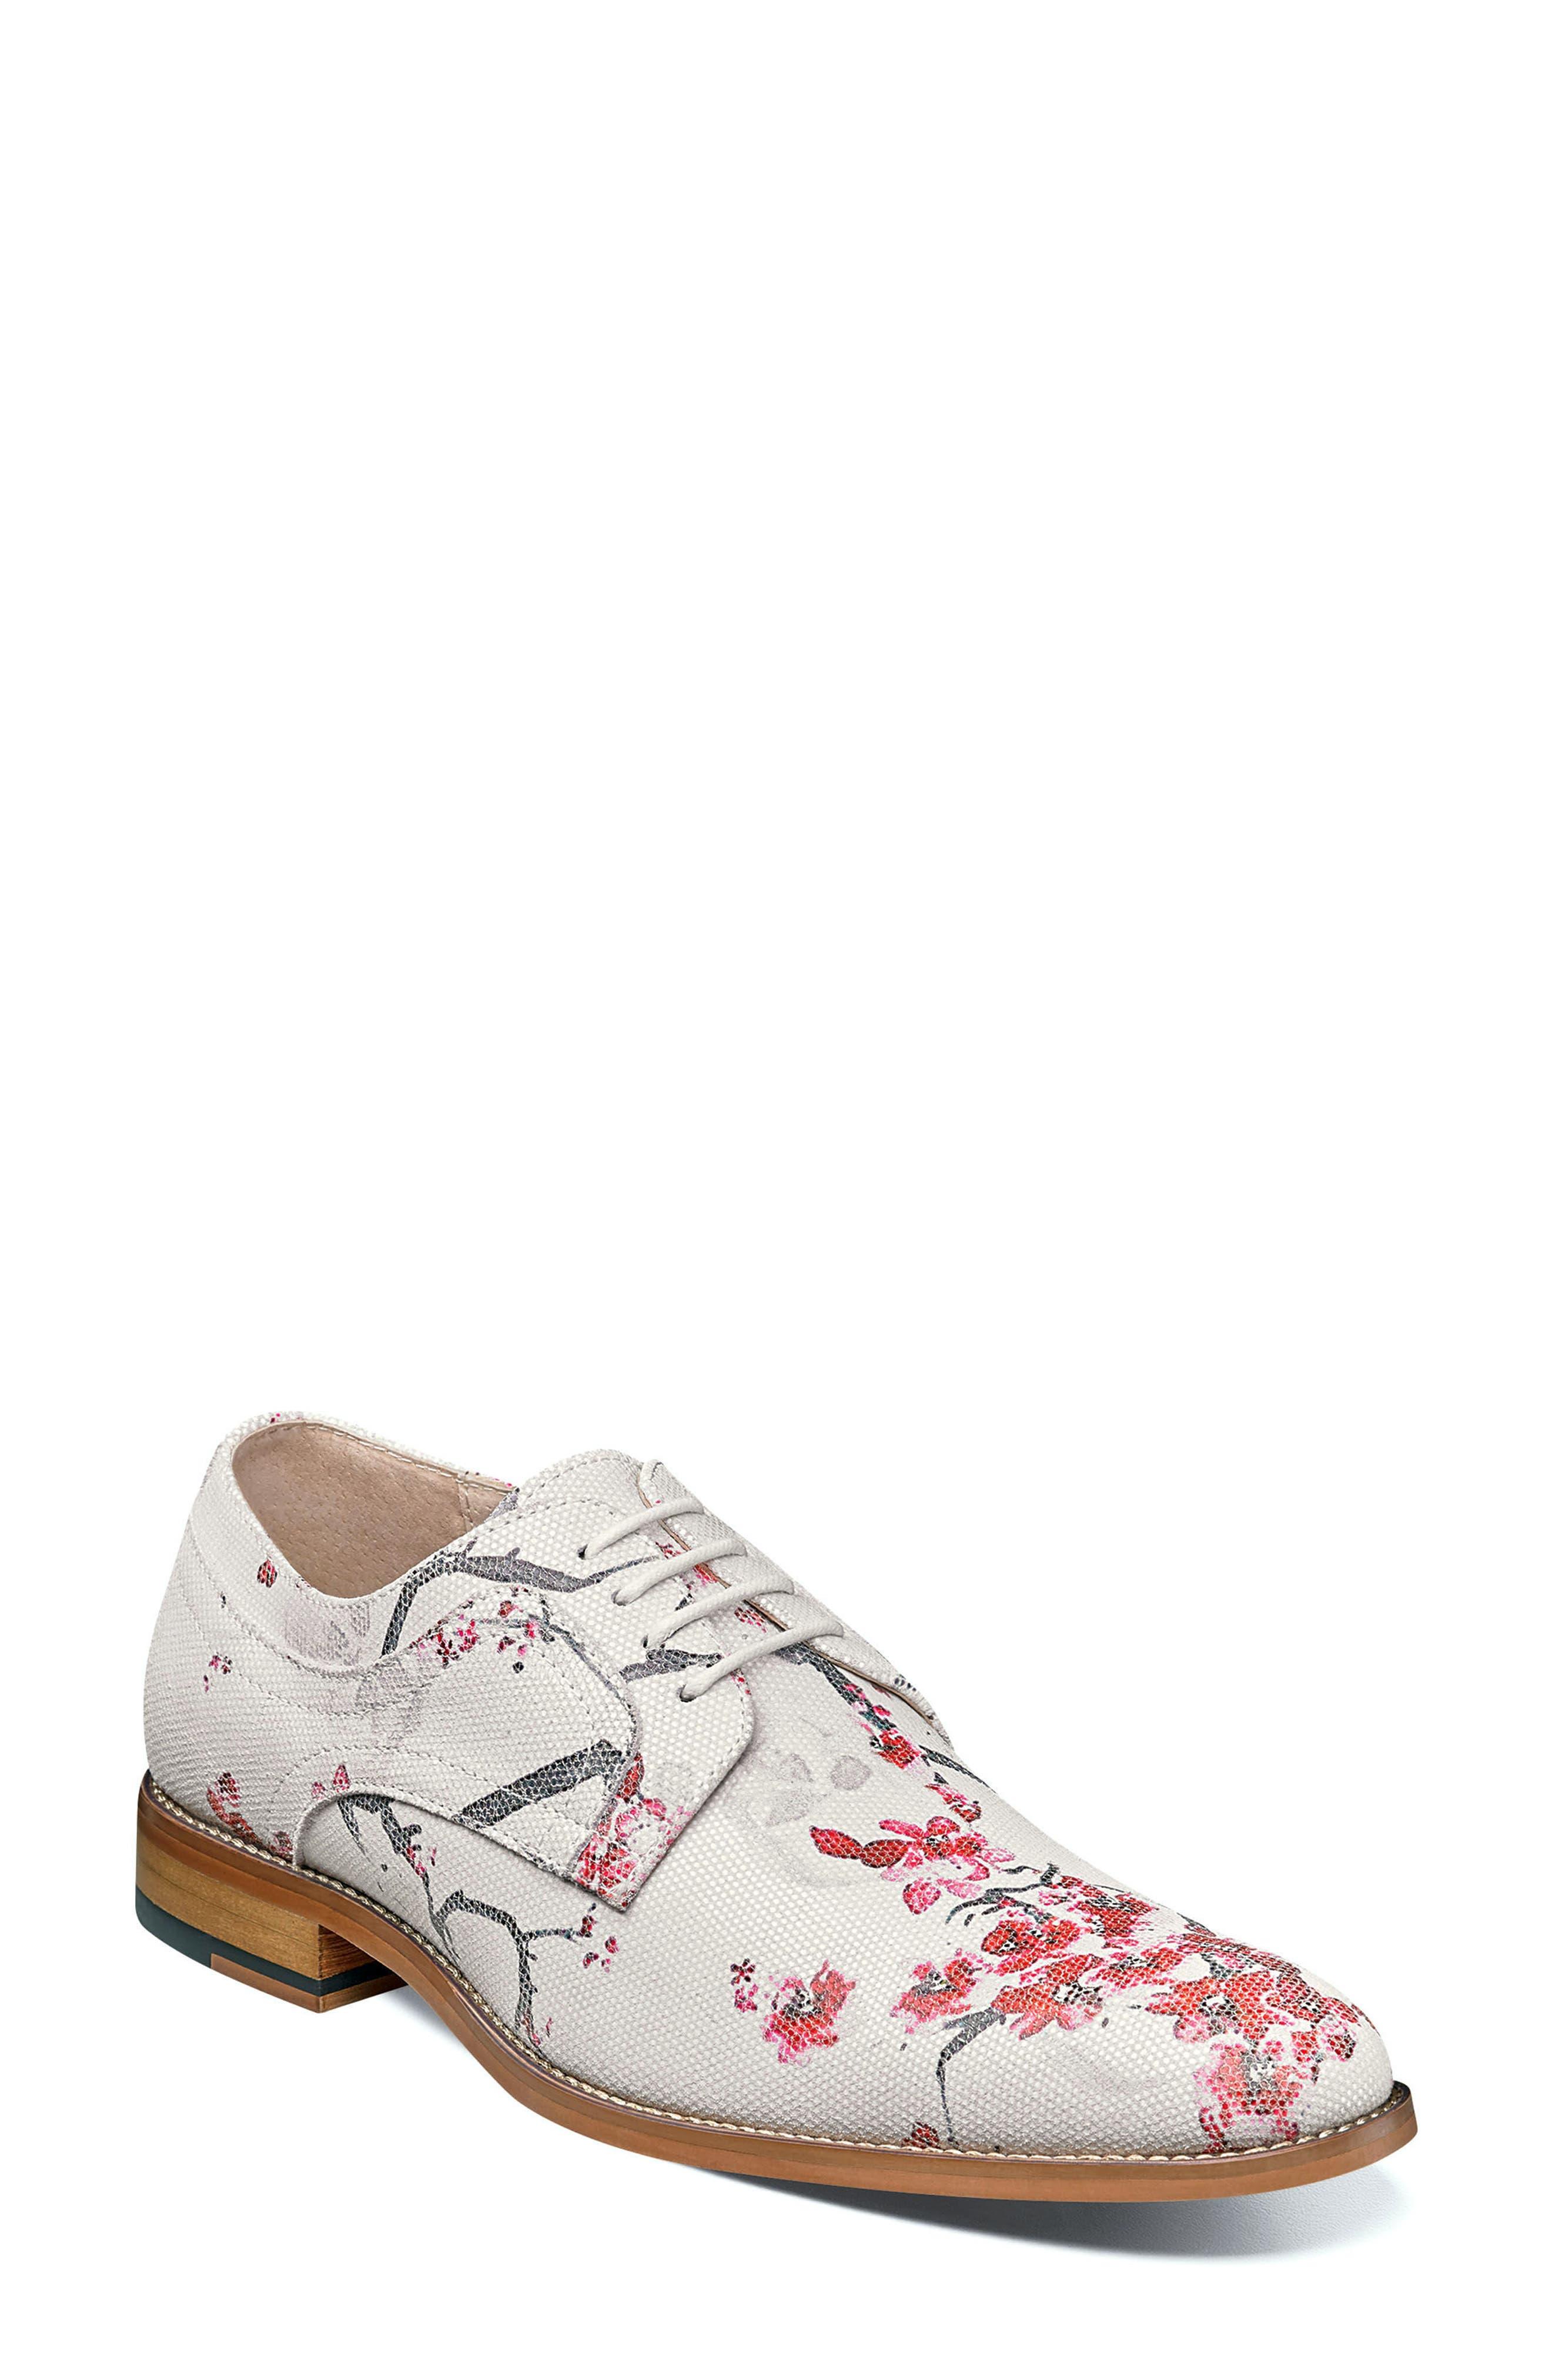 White dress brown shoes